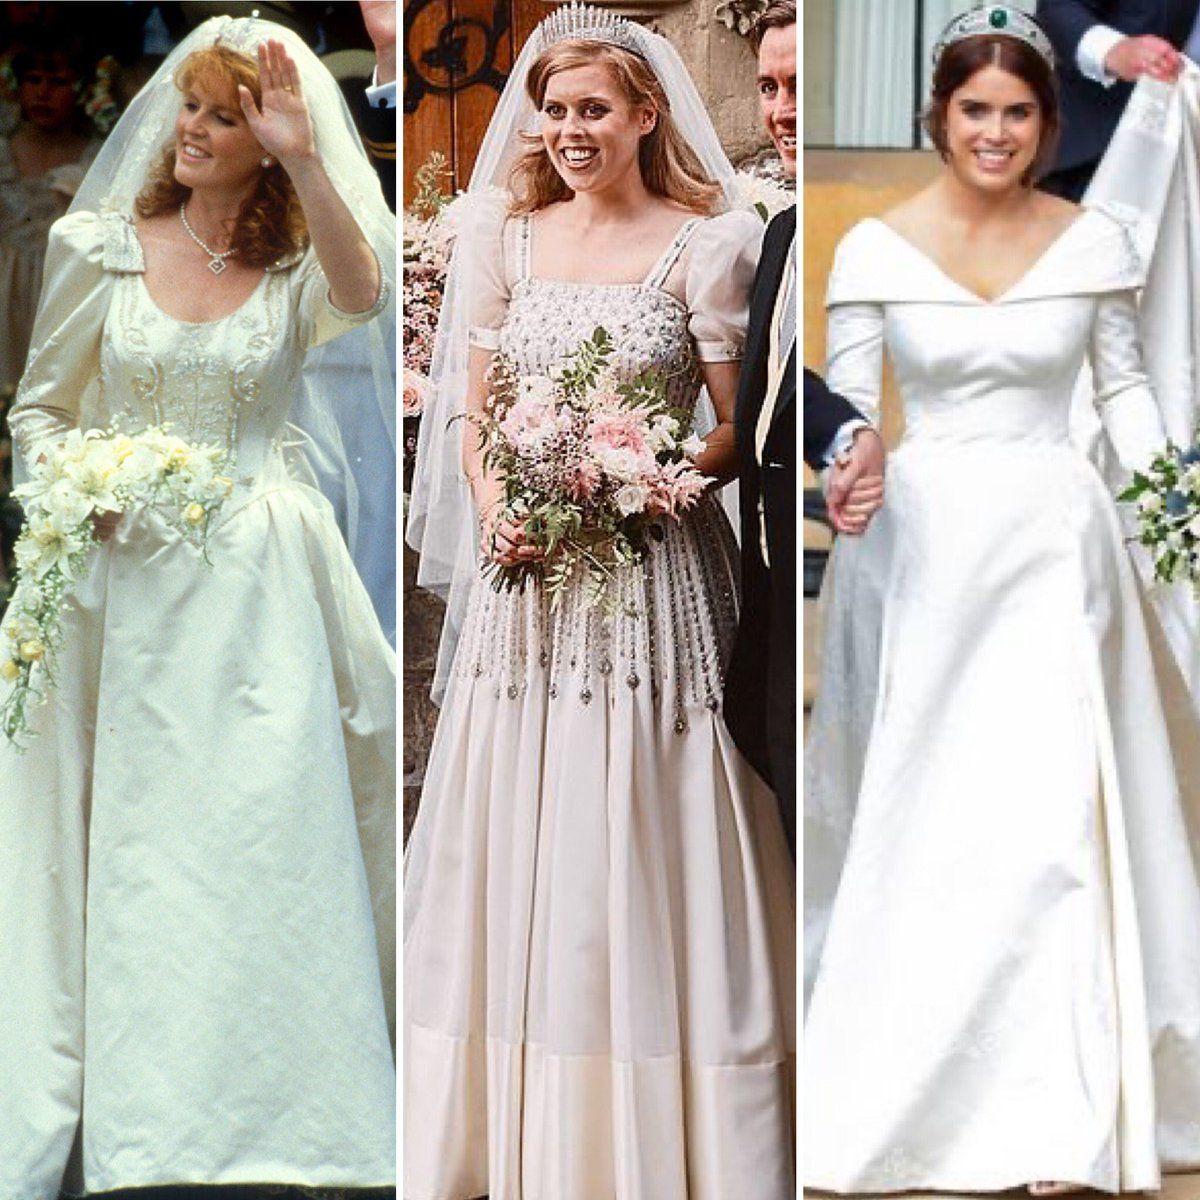 Kelly Mathews On Twitter Royal Wedding Gowns Royal Wedding Dress Bride [ 1200 x 1200 Pixel ]